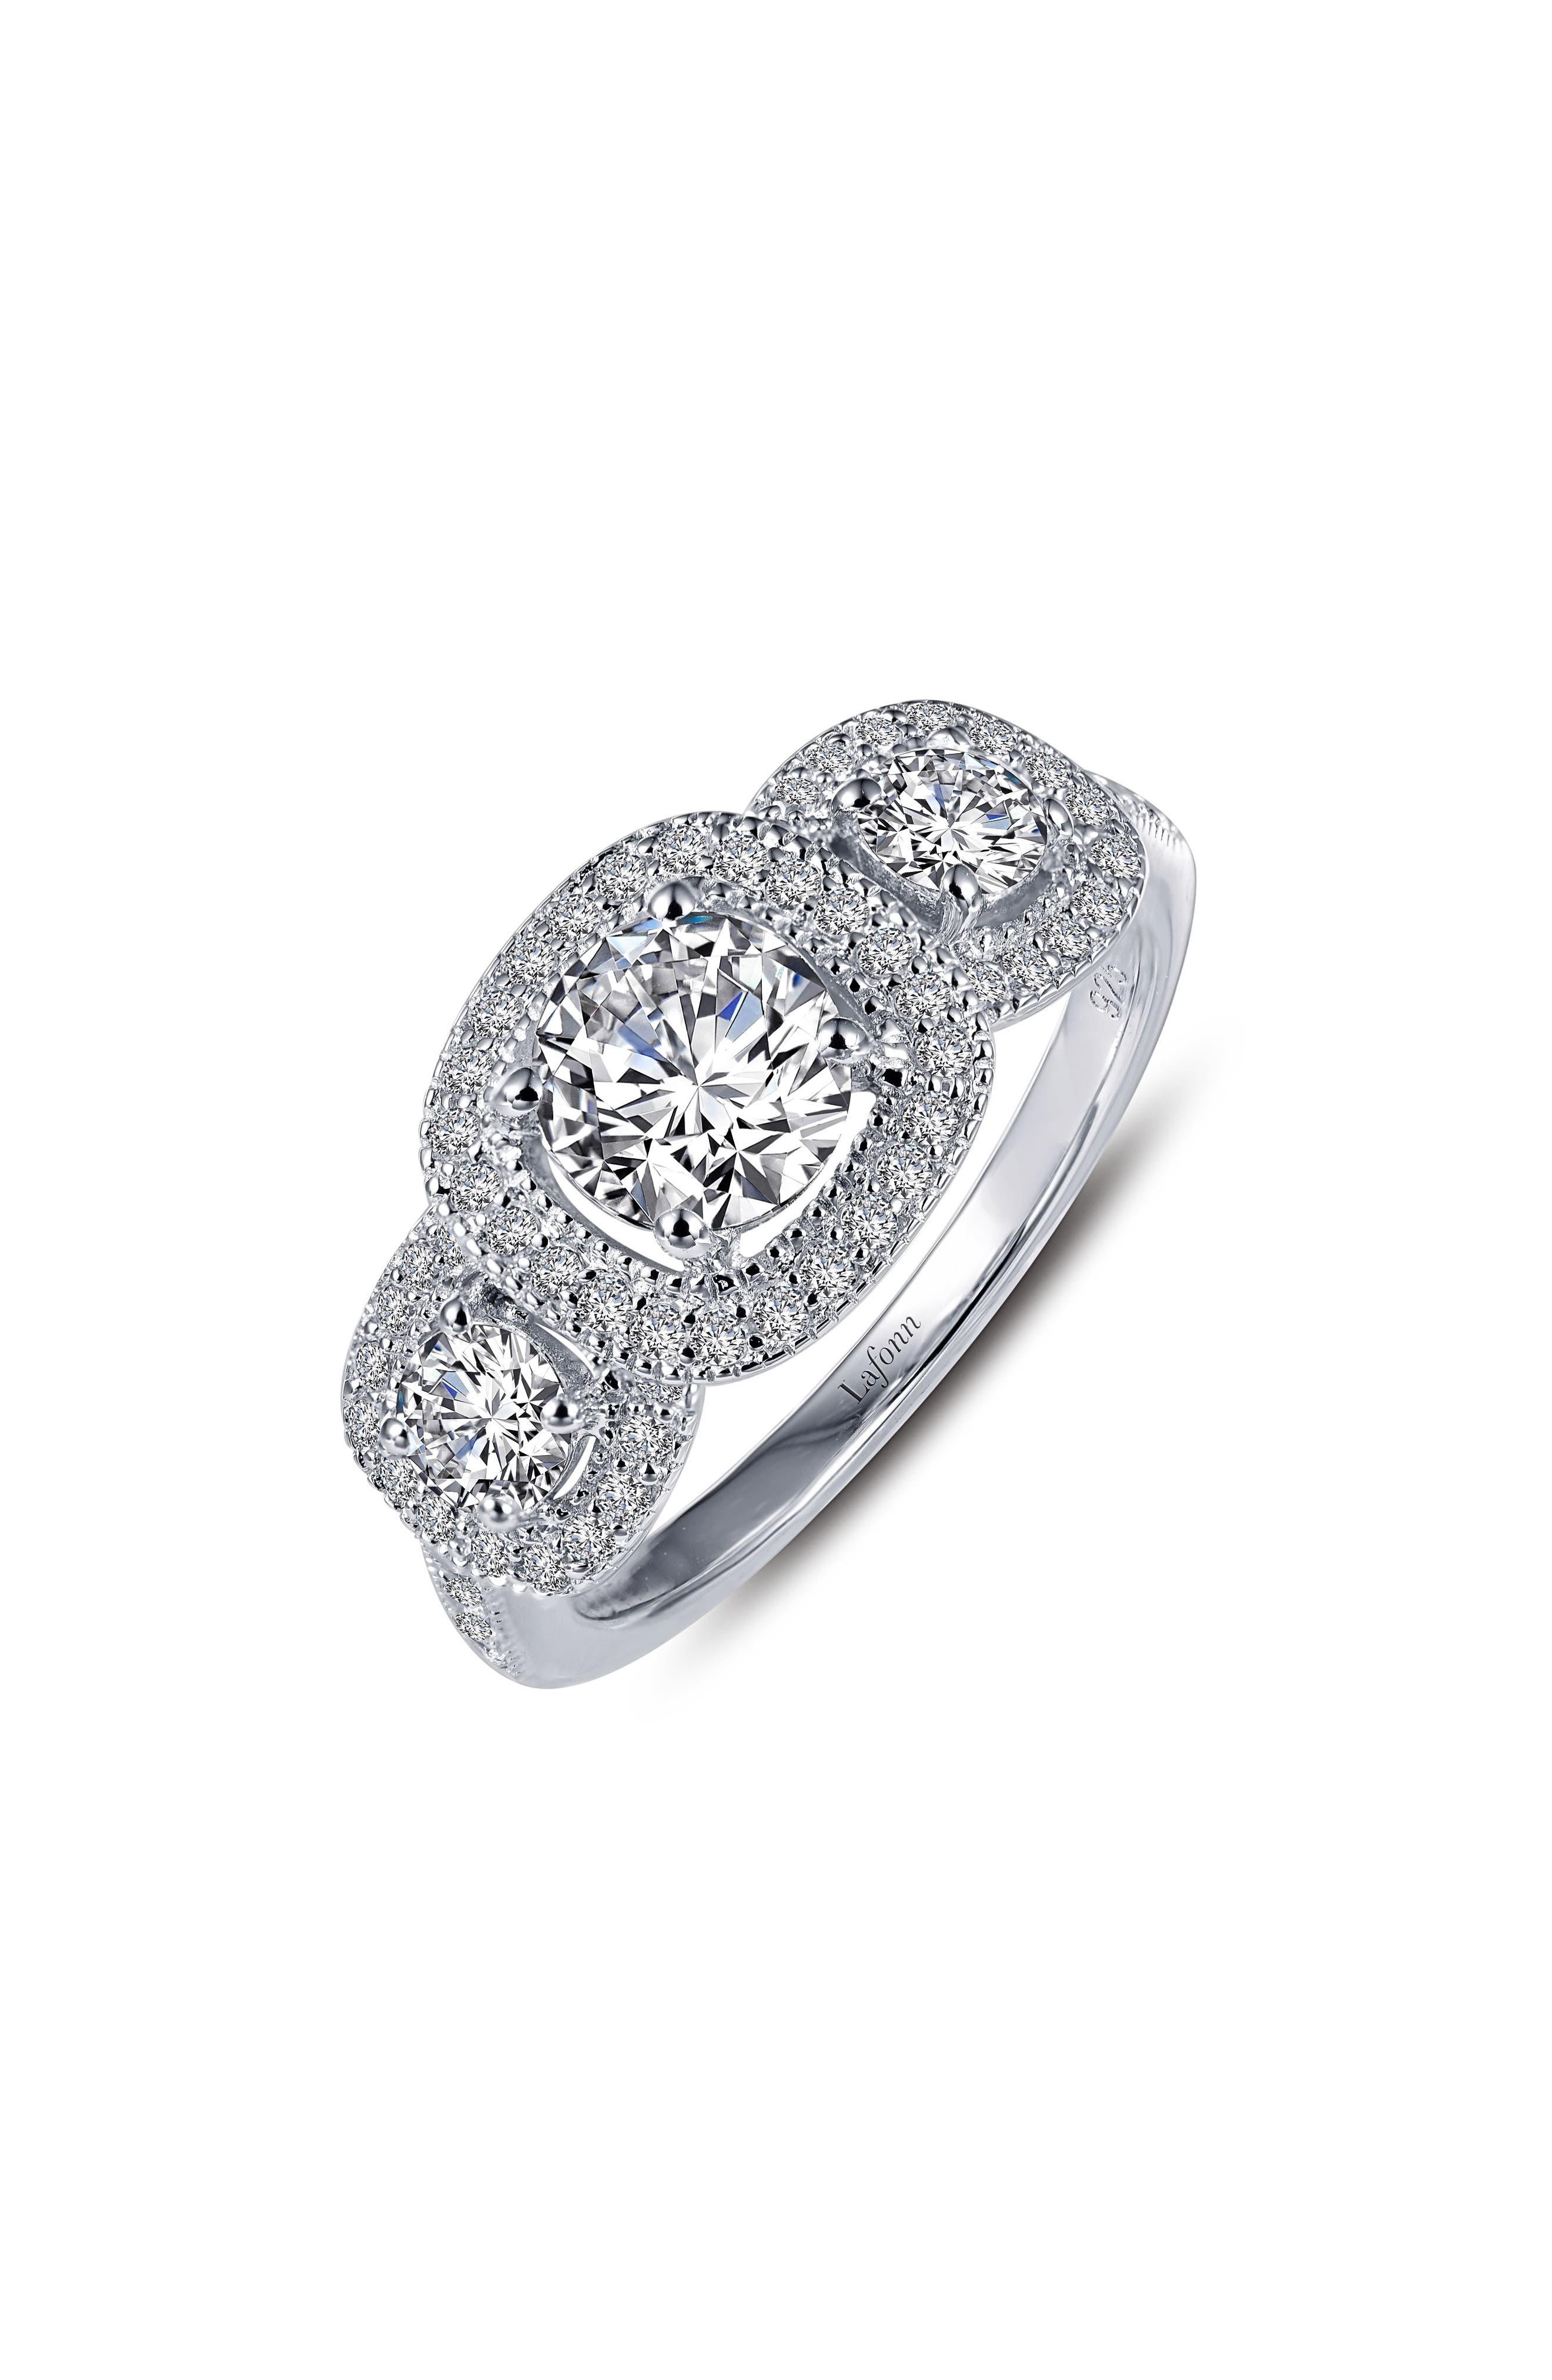 Simulated Diamond Ring,                             Main thumbnail 1, color,                             Silver/ Clear